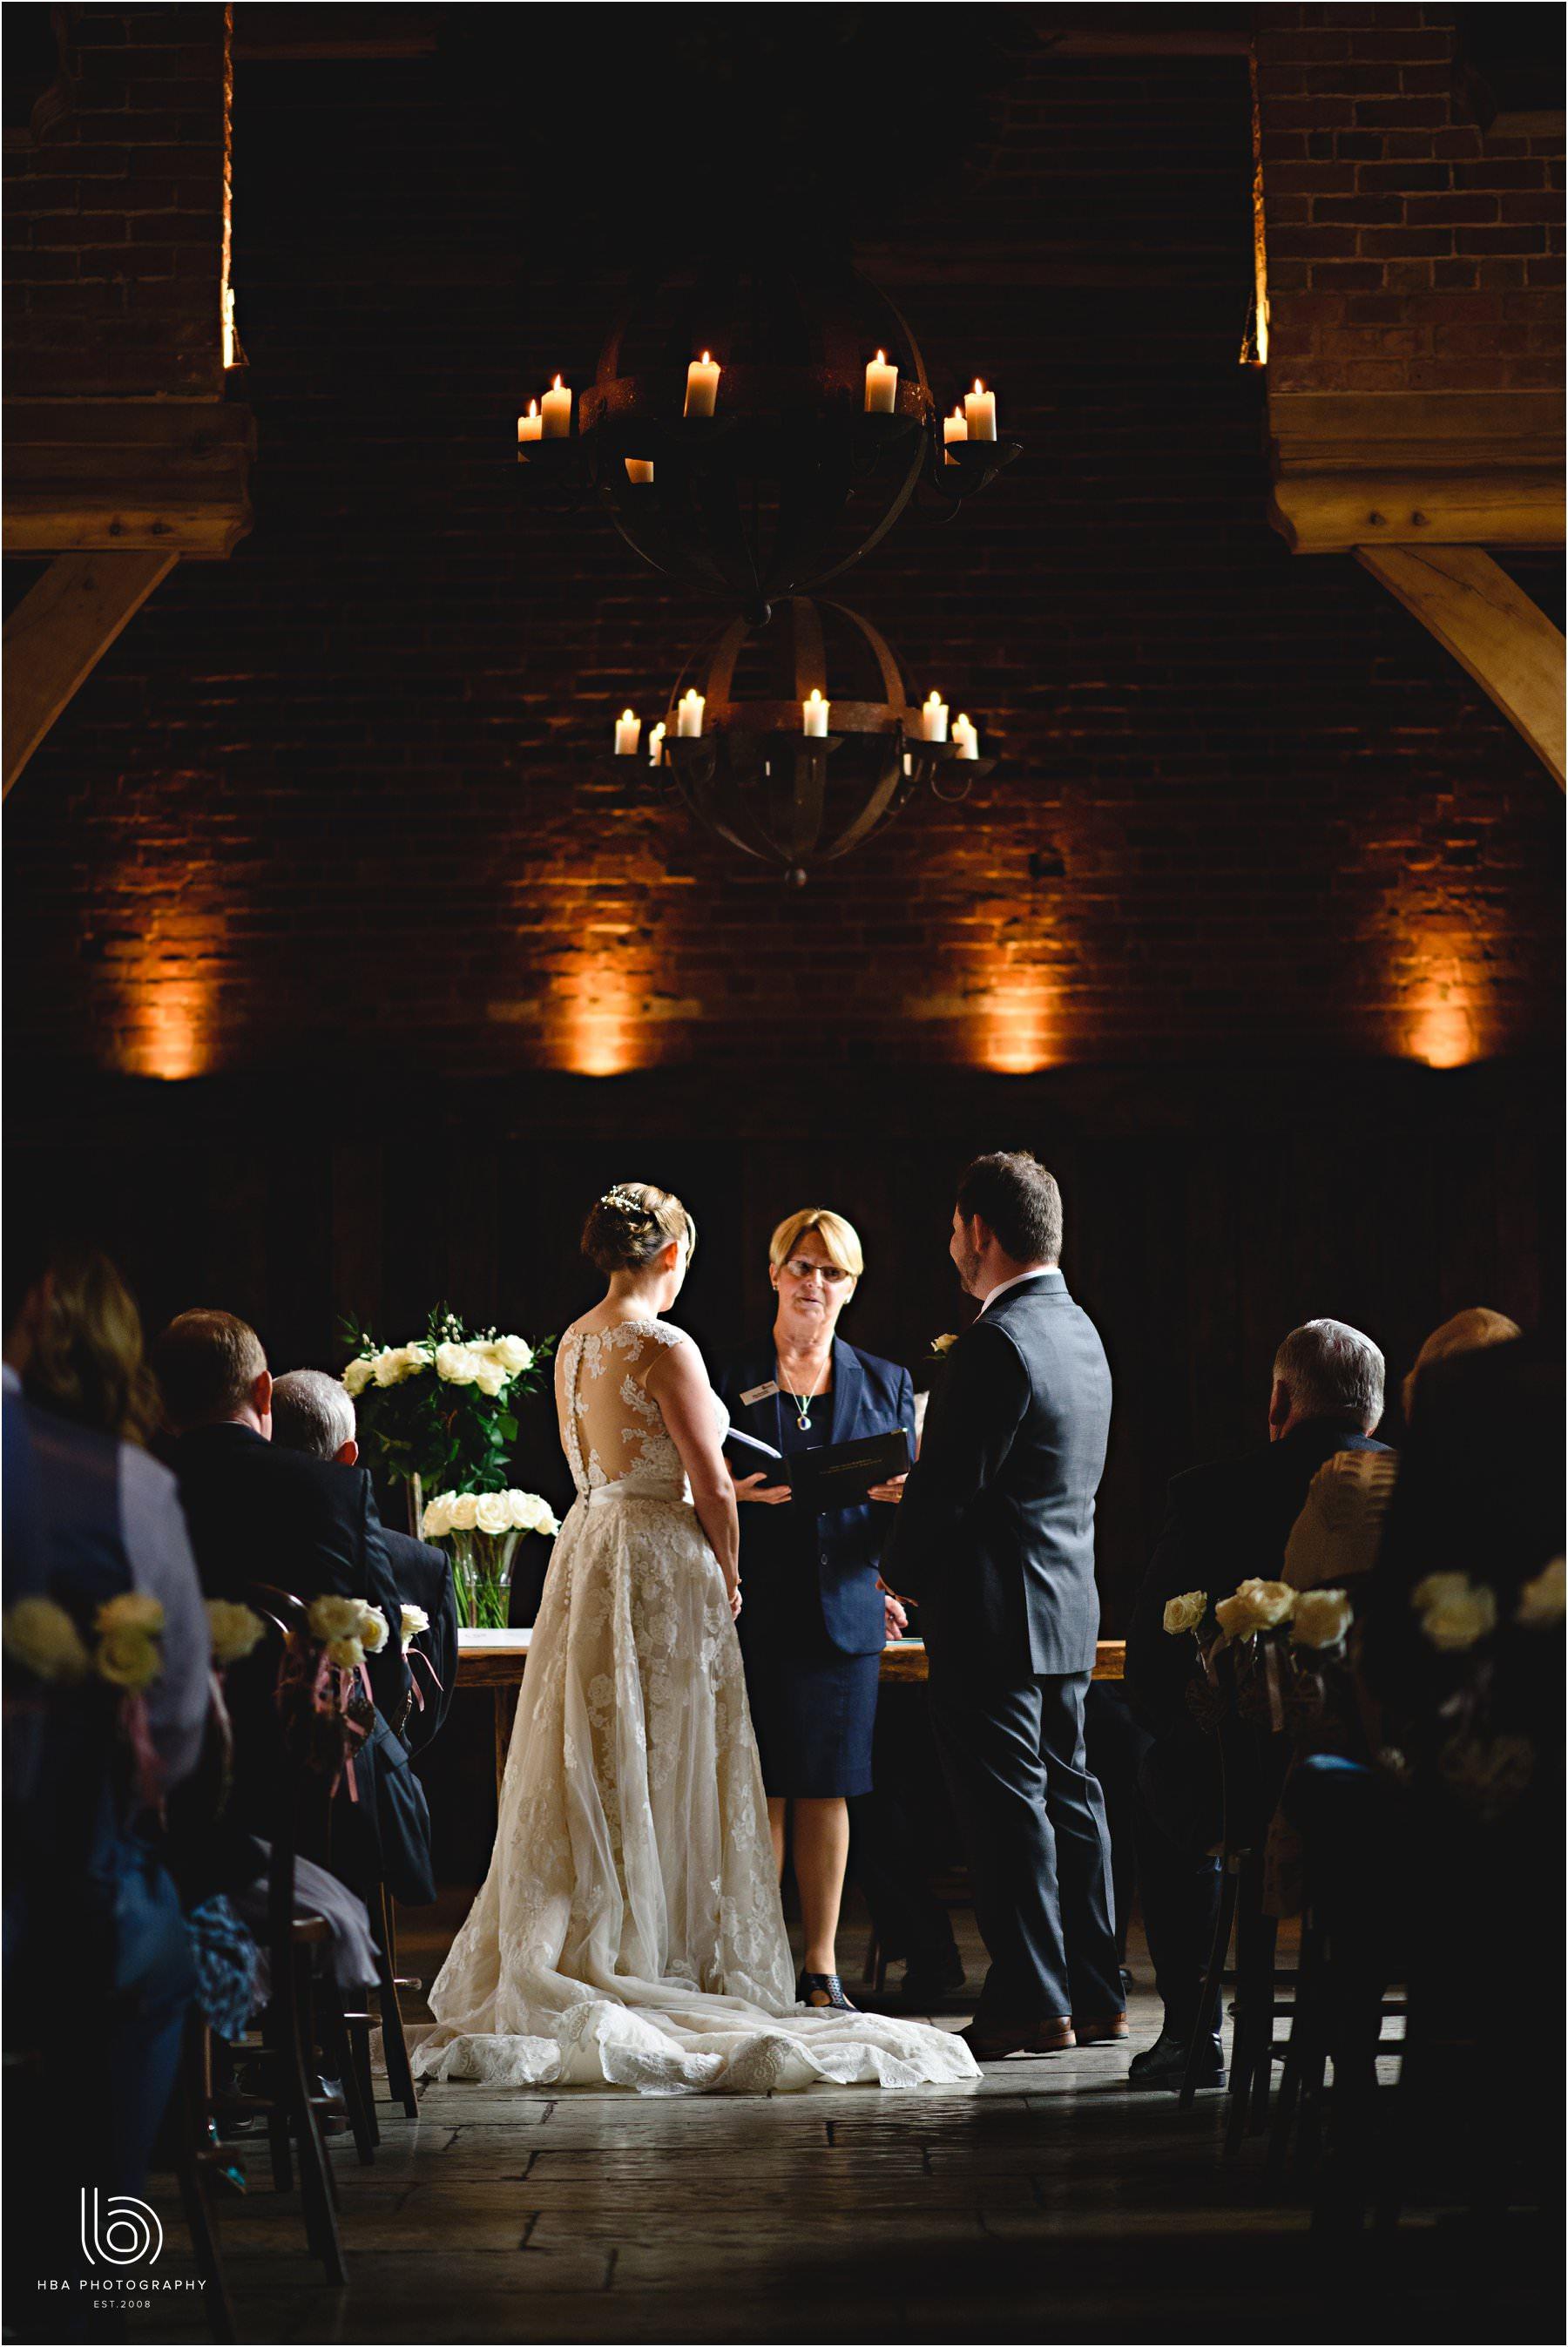 the wedding ceremony at Shustoke Farm Barn